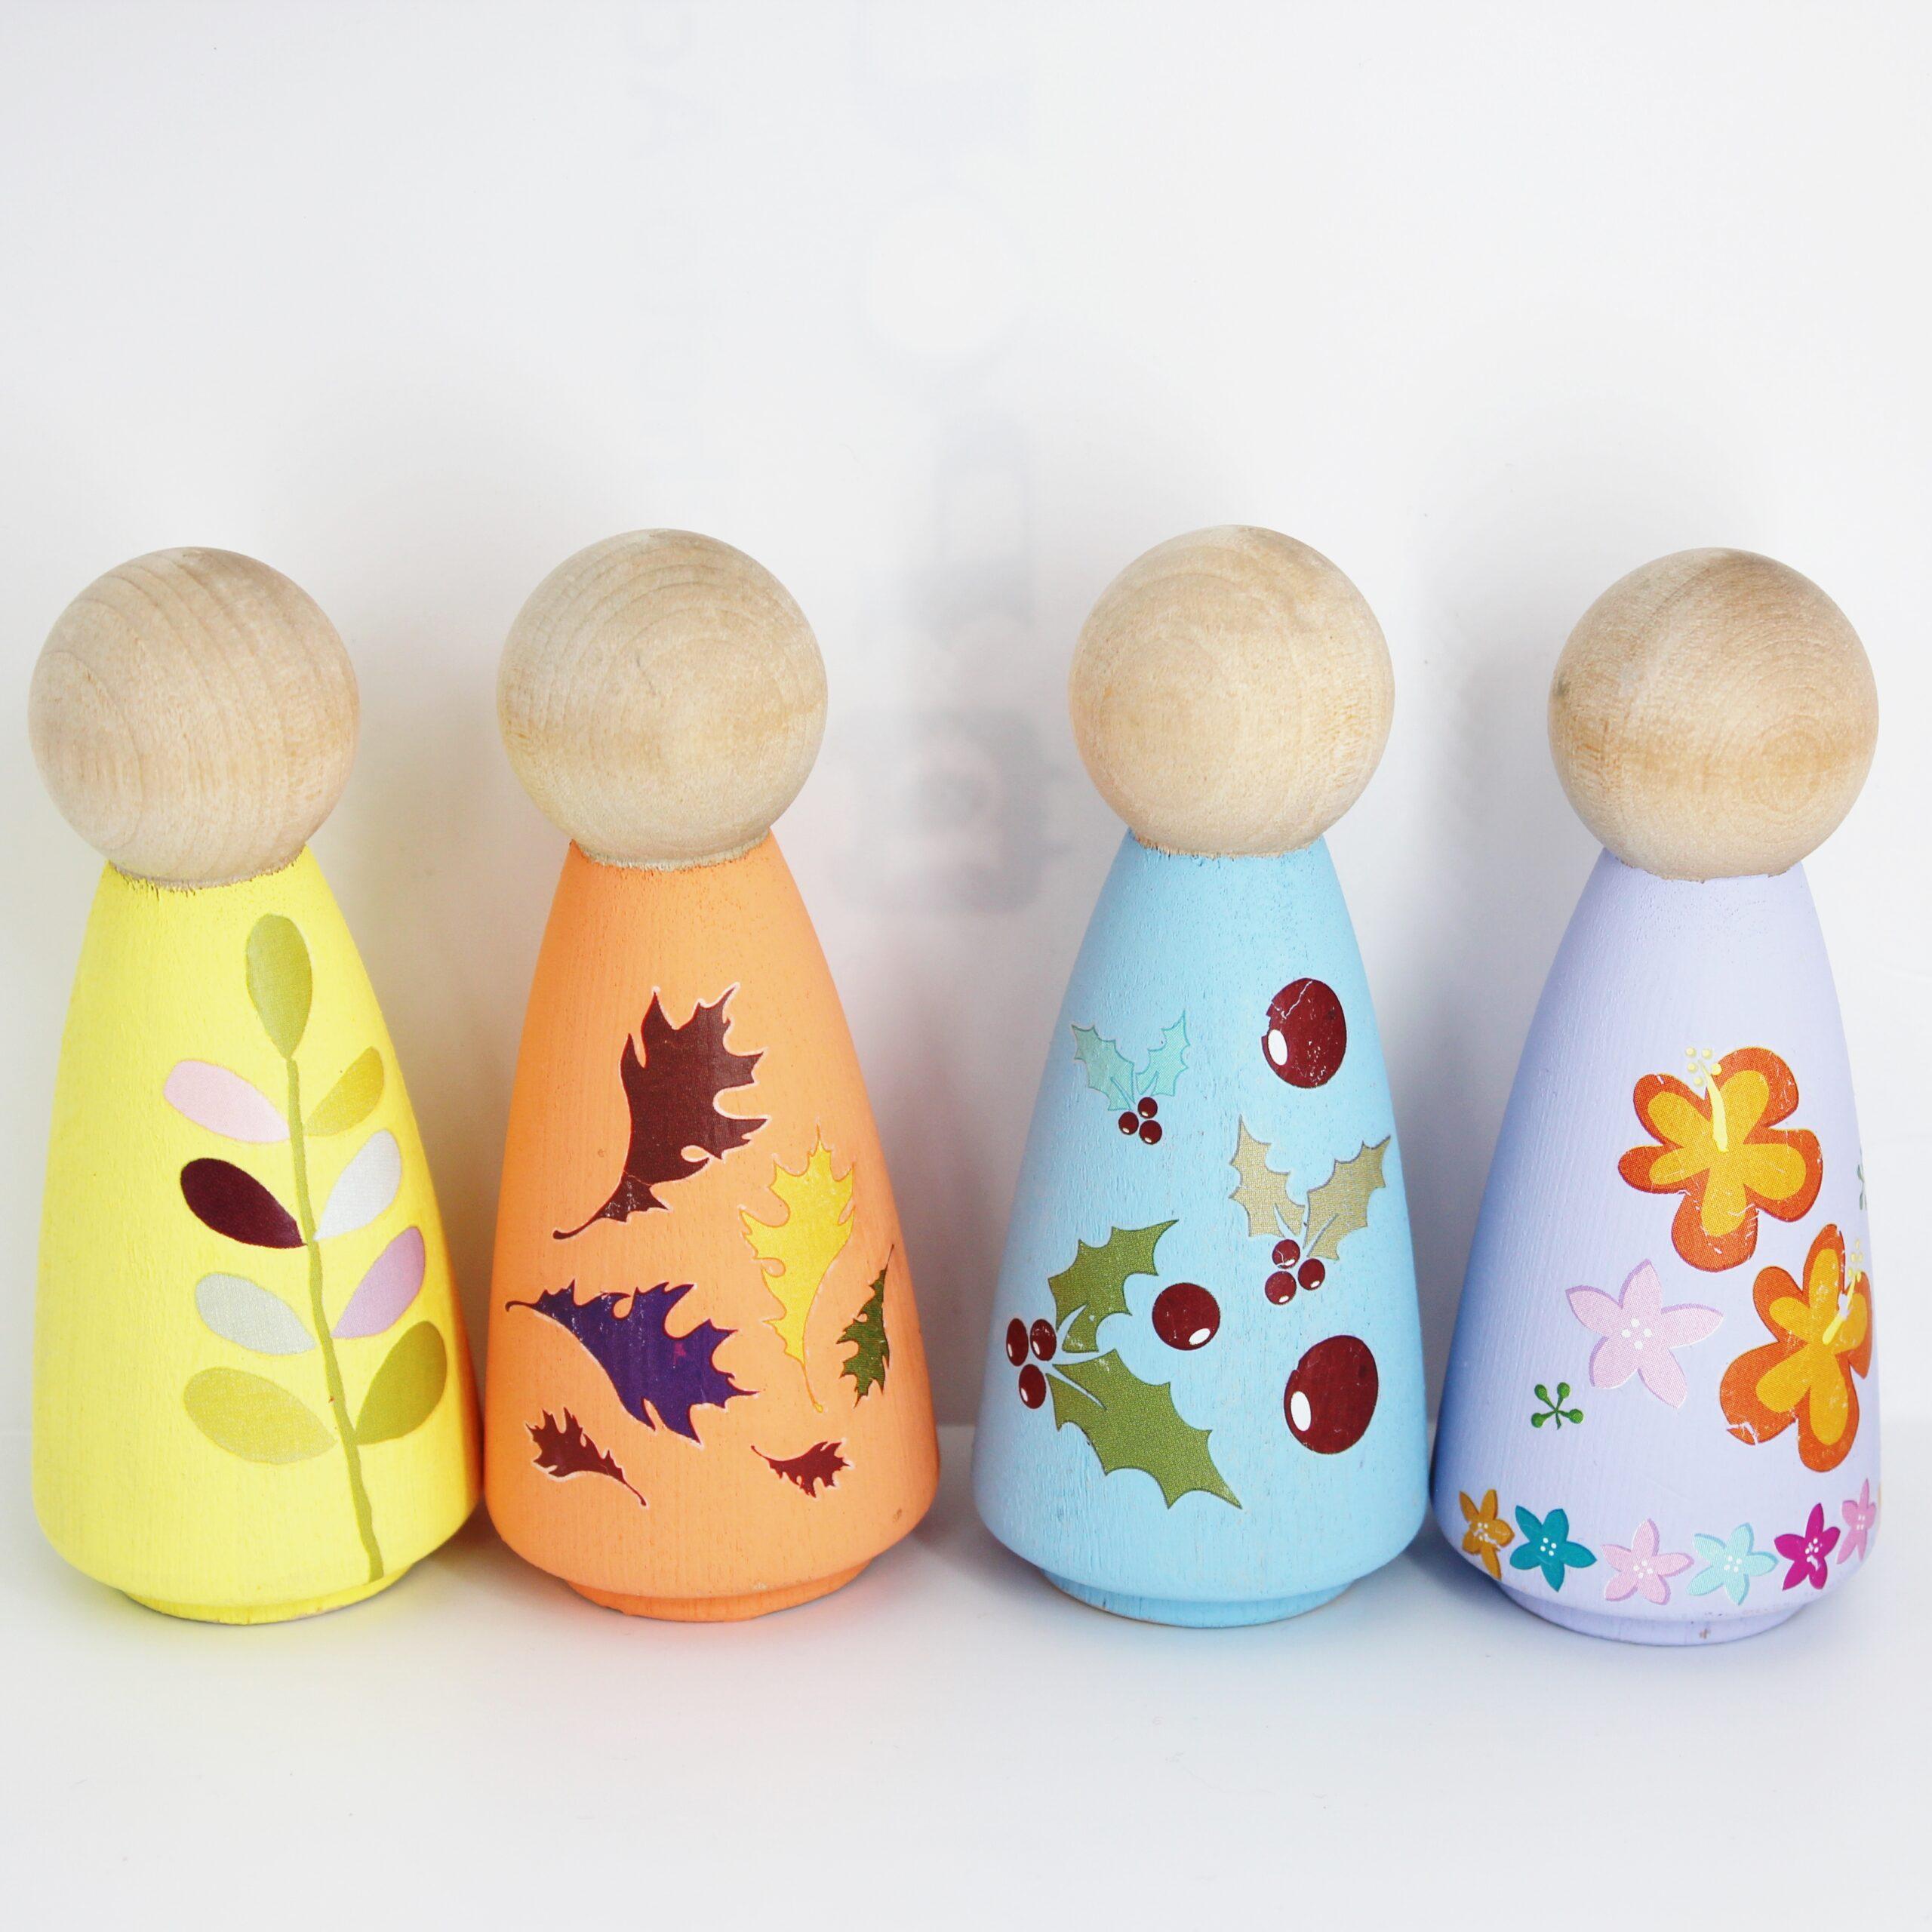 Sensory Box Family Seasonal Wooden Stacker People